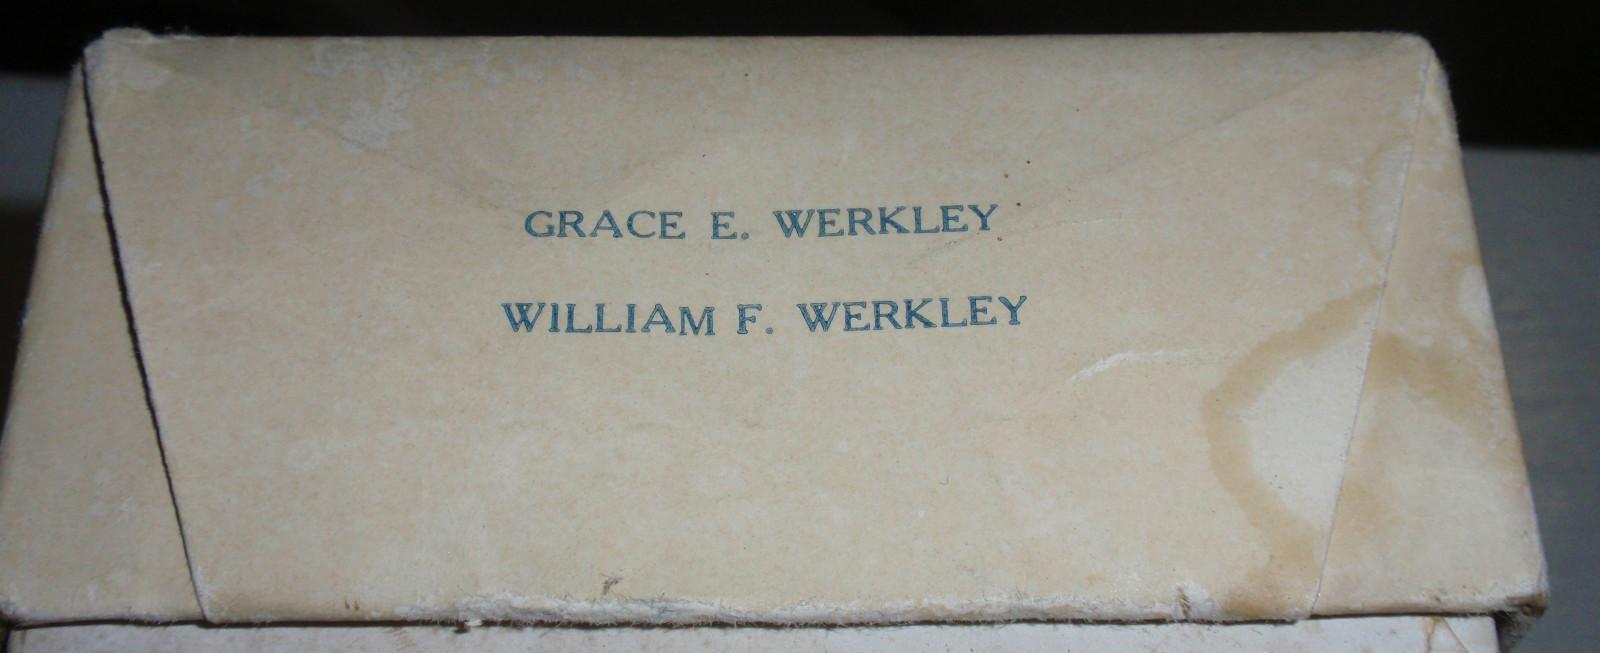 Werkley's Home Made Candies, 115 Goundry, illustrated box, detail (c1940).jpg